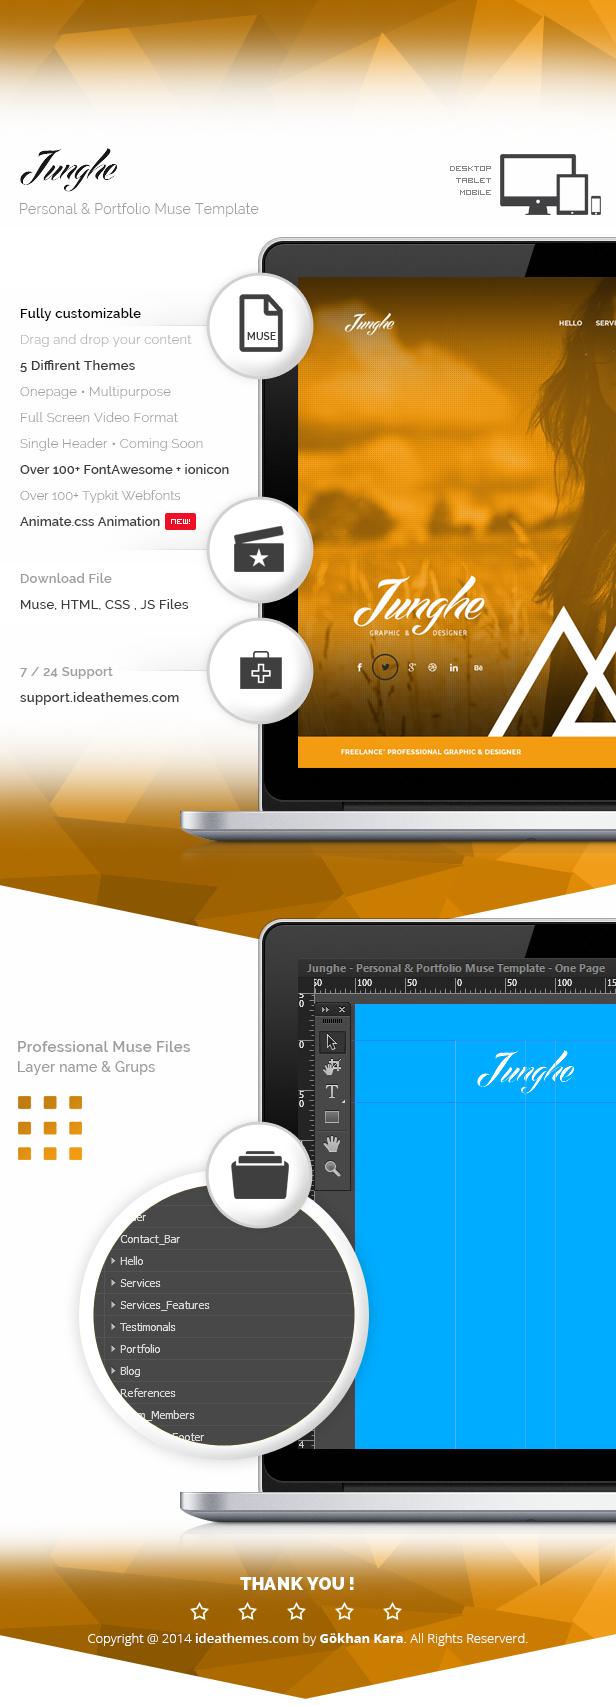 Junghe - Personal & Portfolio Muse Template - 1